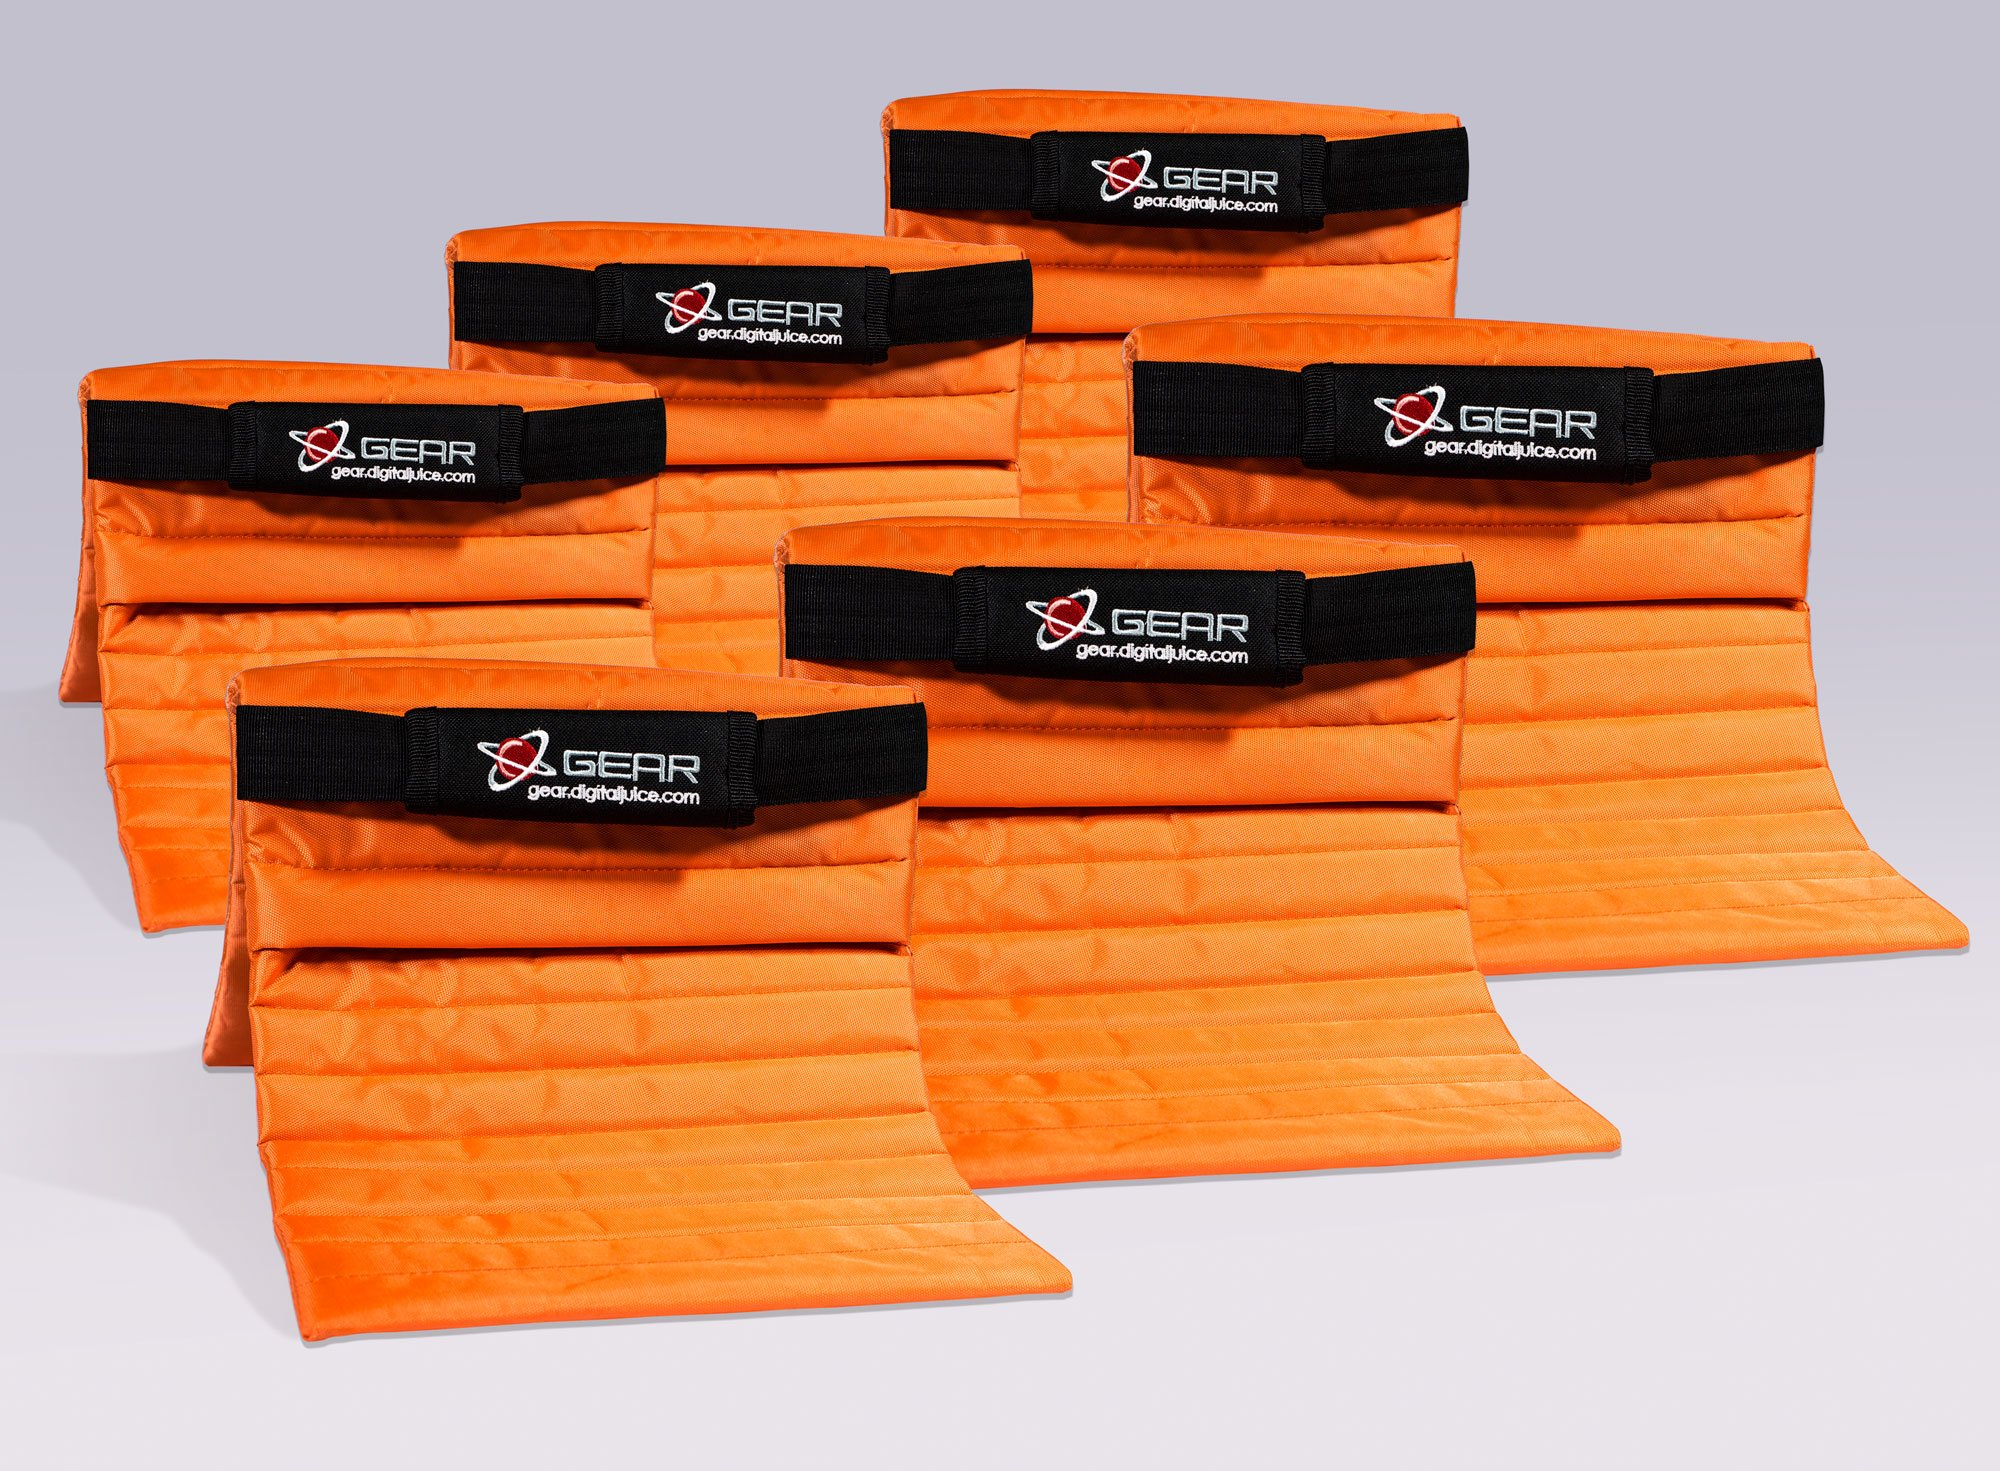 Digital Juice Orange Sand Bag for Photography; Affordable Heavy Duty Saddlebag Design, Saddle Sandbags for Photo Studio Light Stands, tripods, Lighting Accessories (Orange); Without Sand (6 Pack) by Digital Juice